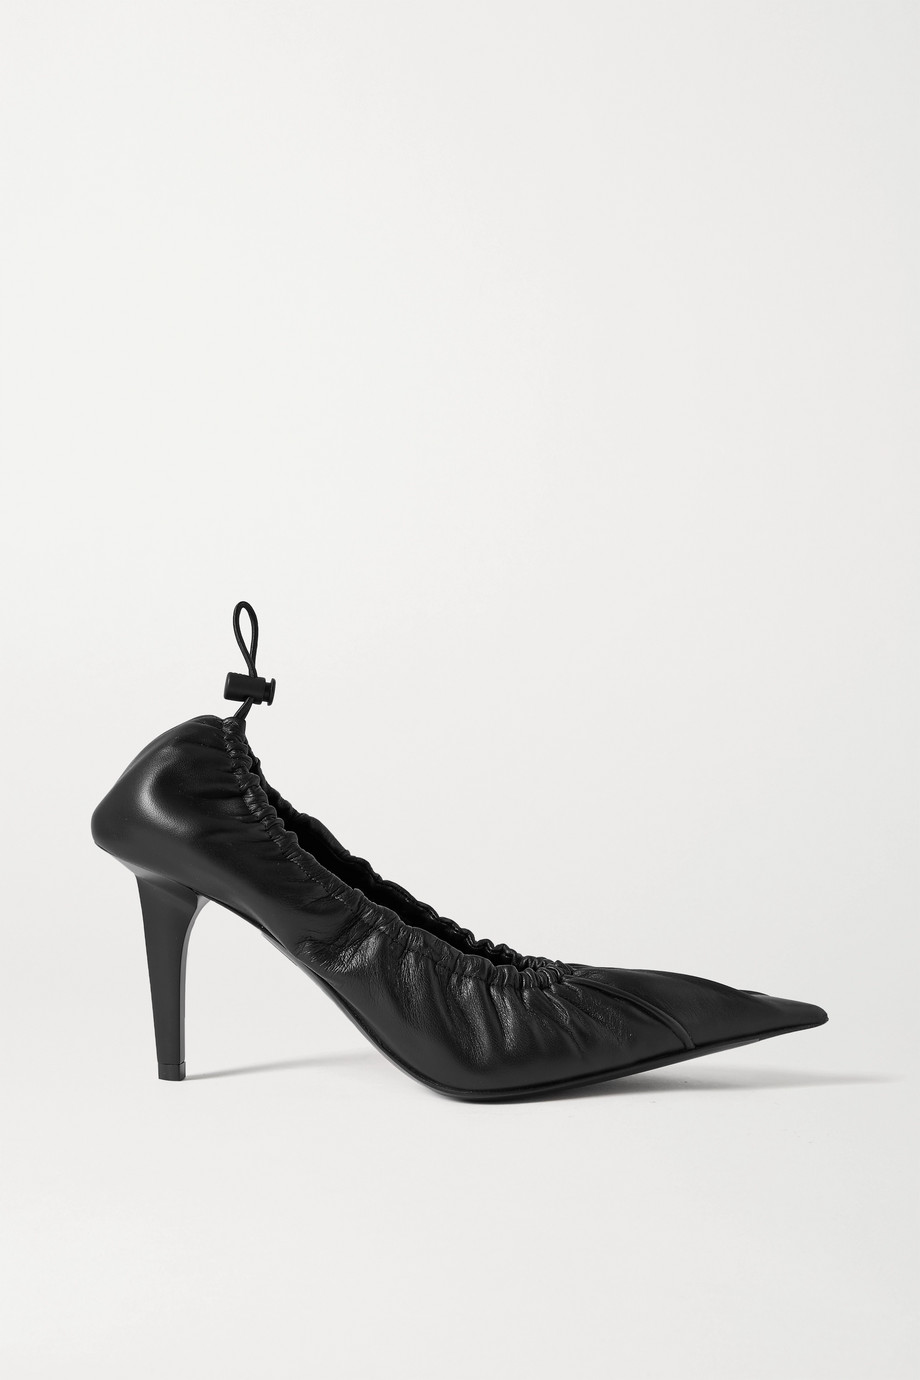 Balenciaga Scrunch Knife Pumps aus Leder mit Raffungen